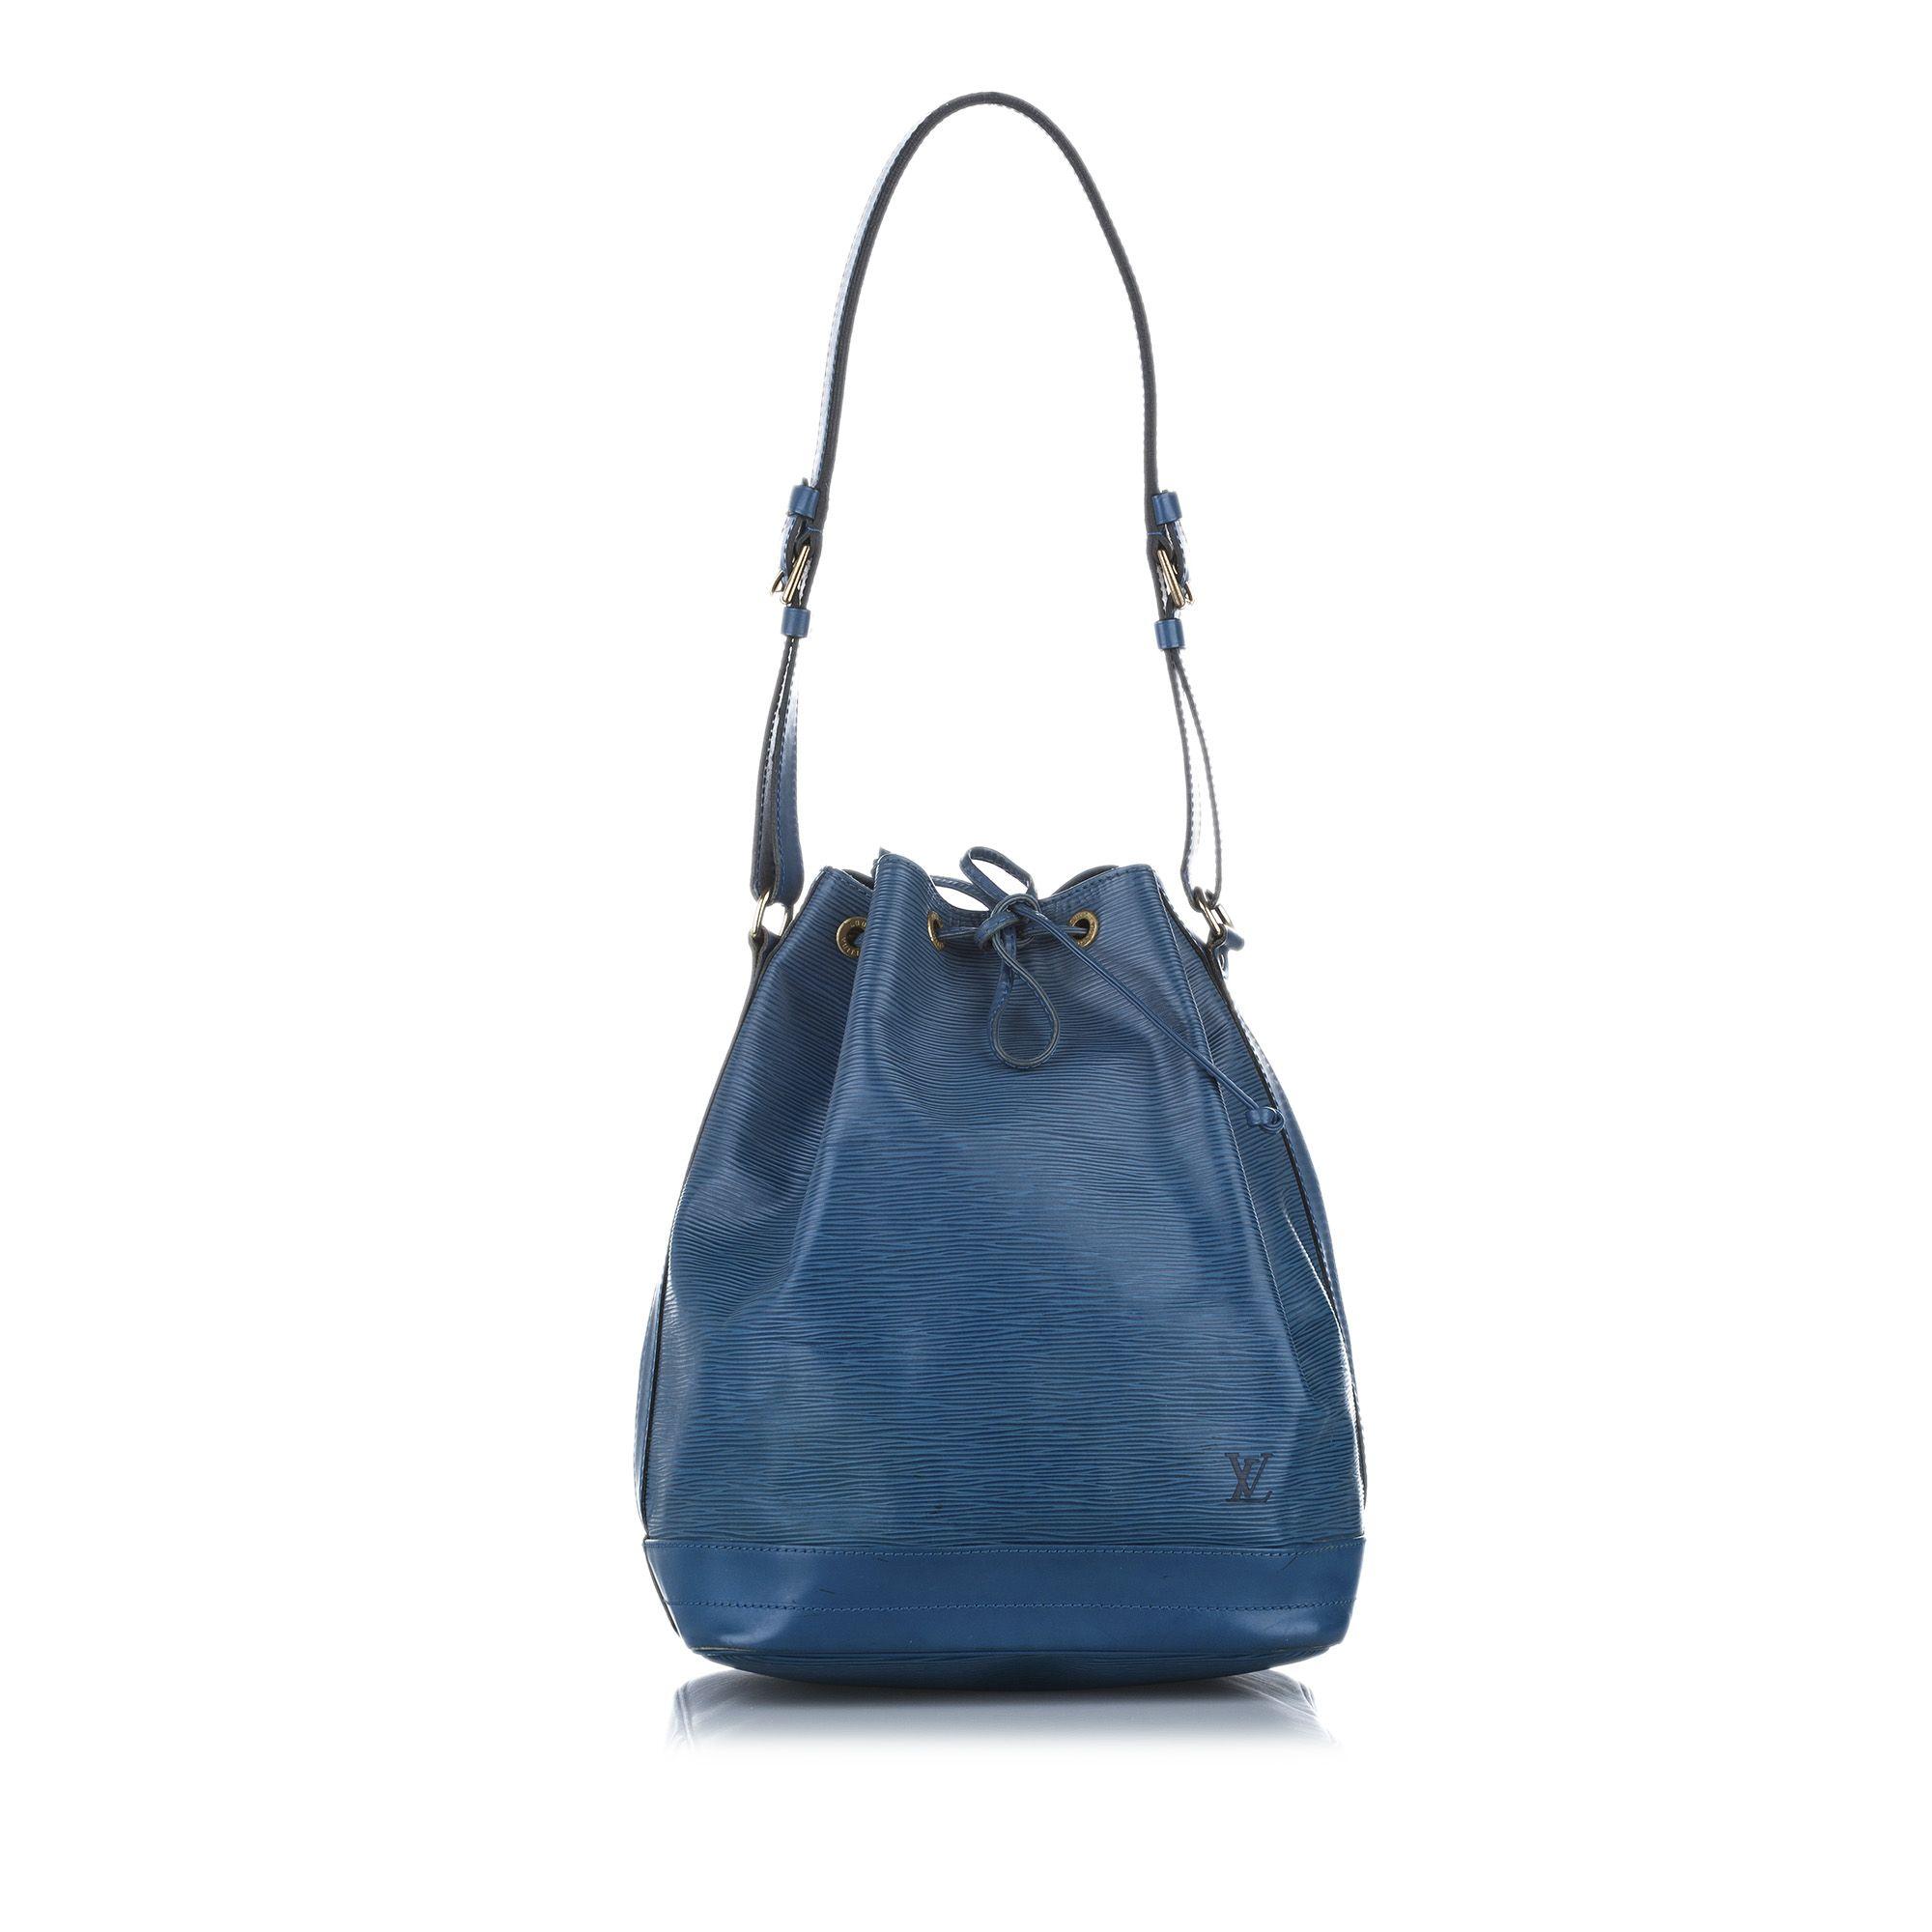 Vintage Louis Vuitton Epi Noe Blue